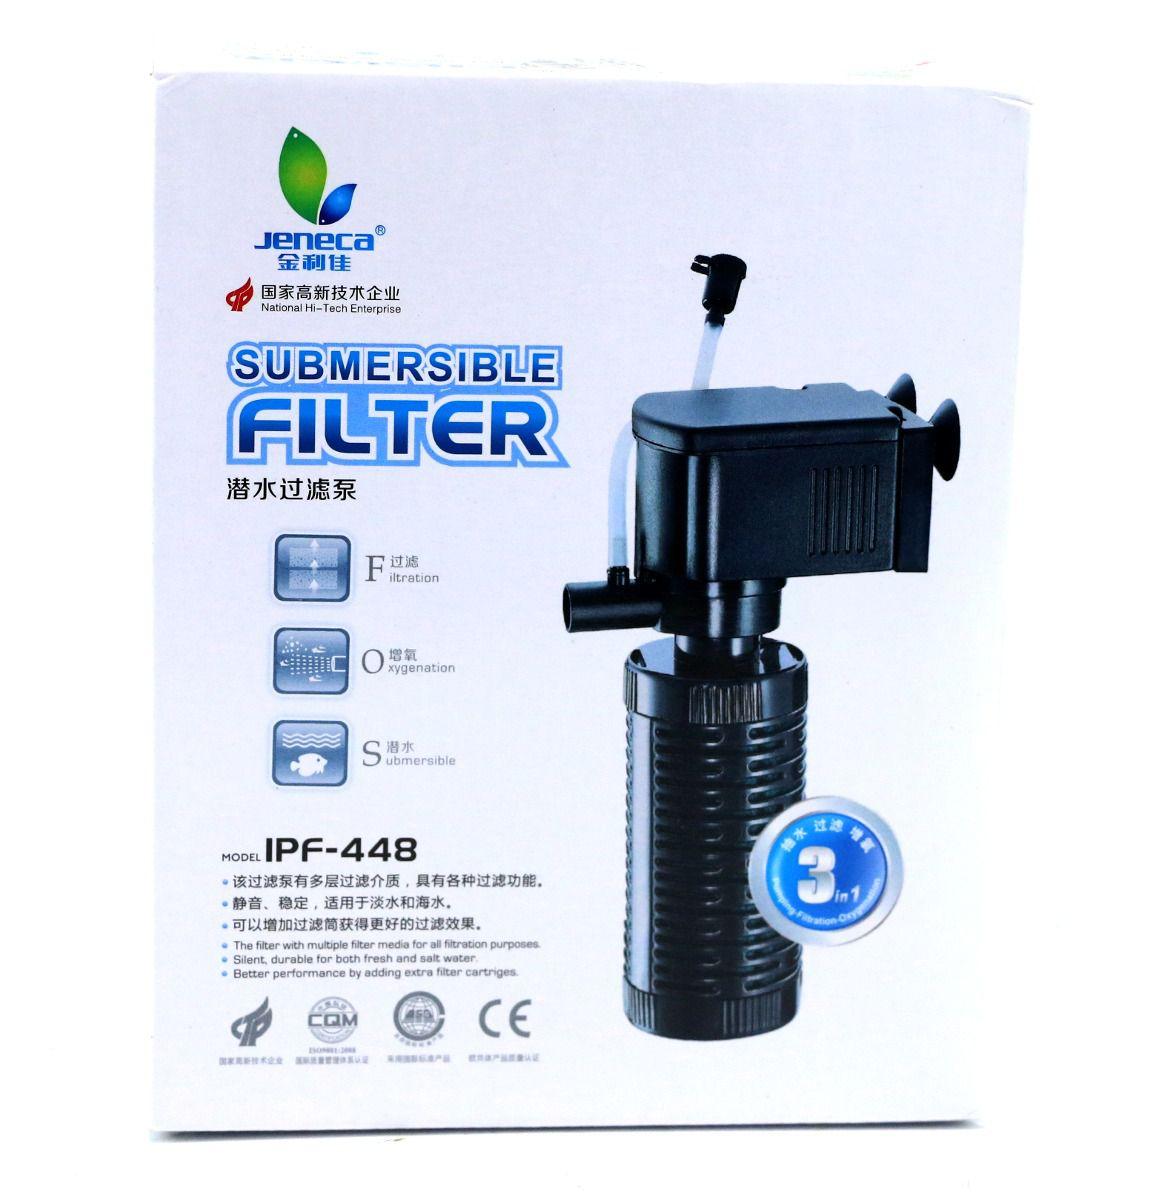 Filtro Interno Aleas Jeneca  IPF 448  - FISHPET Comércio de Acessórios para Animais Ltda.